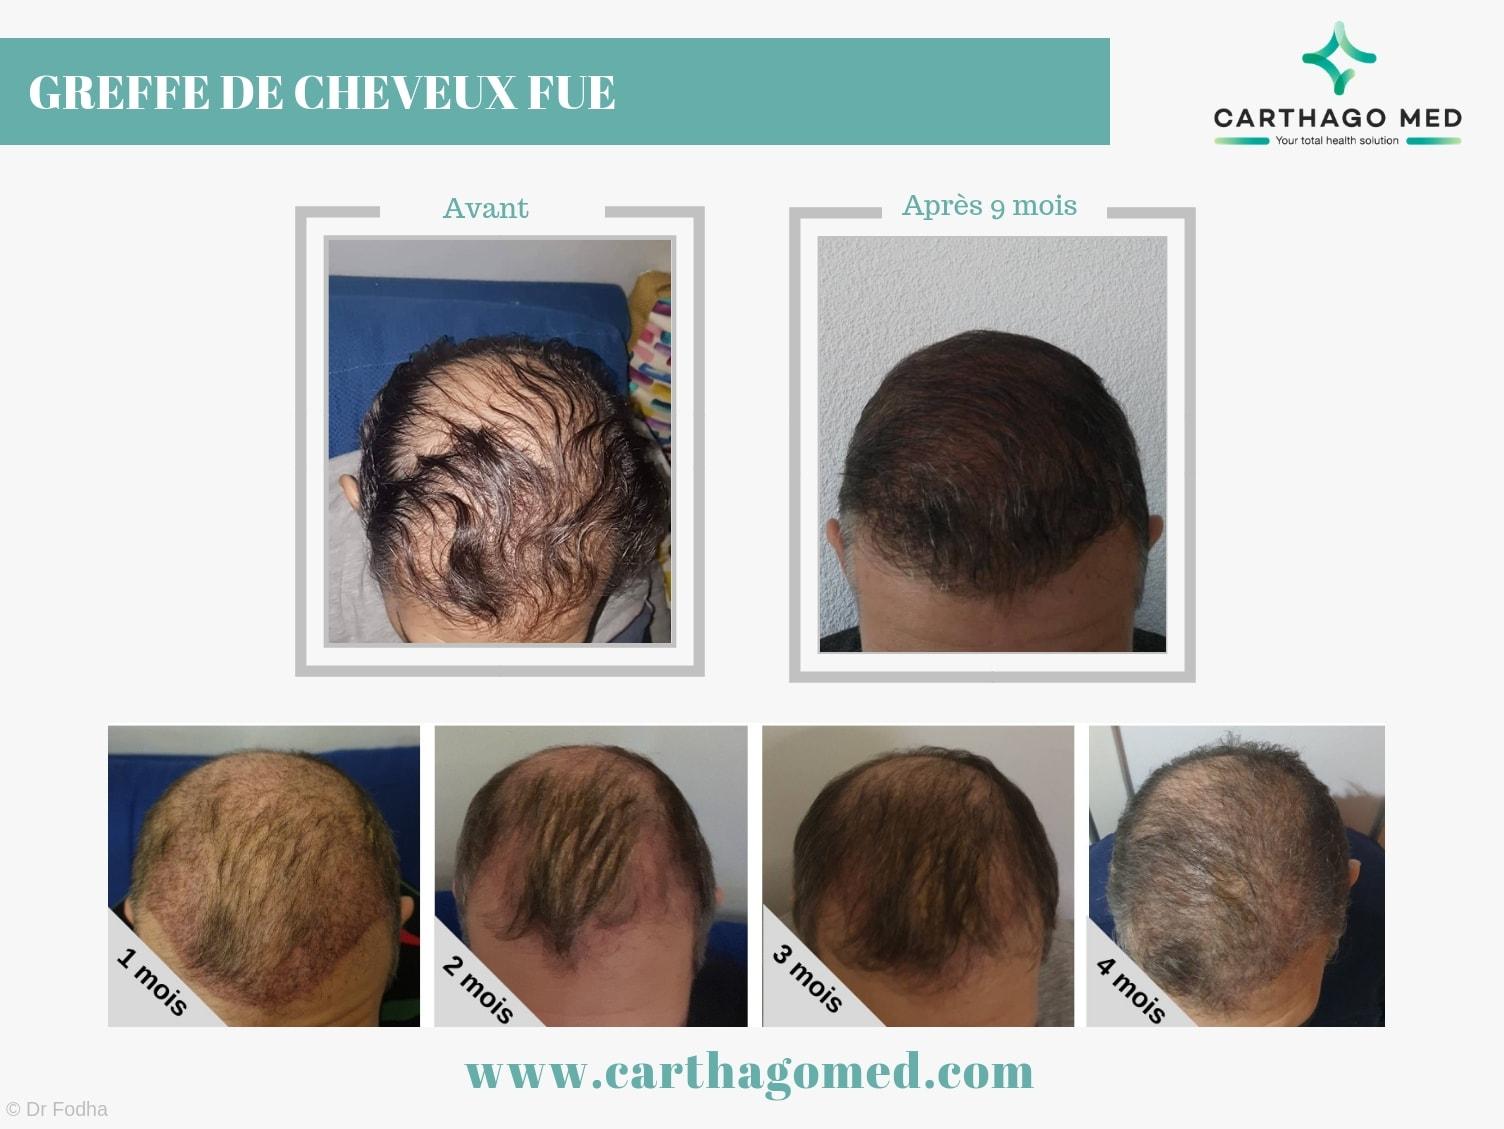 Greffe de cheveux 1 Carthago Med 5-min